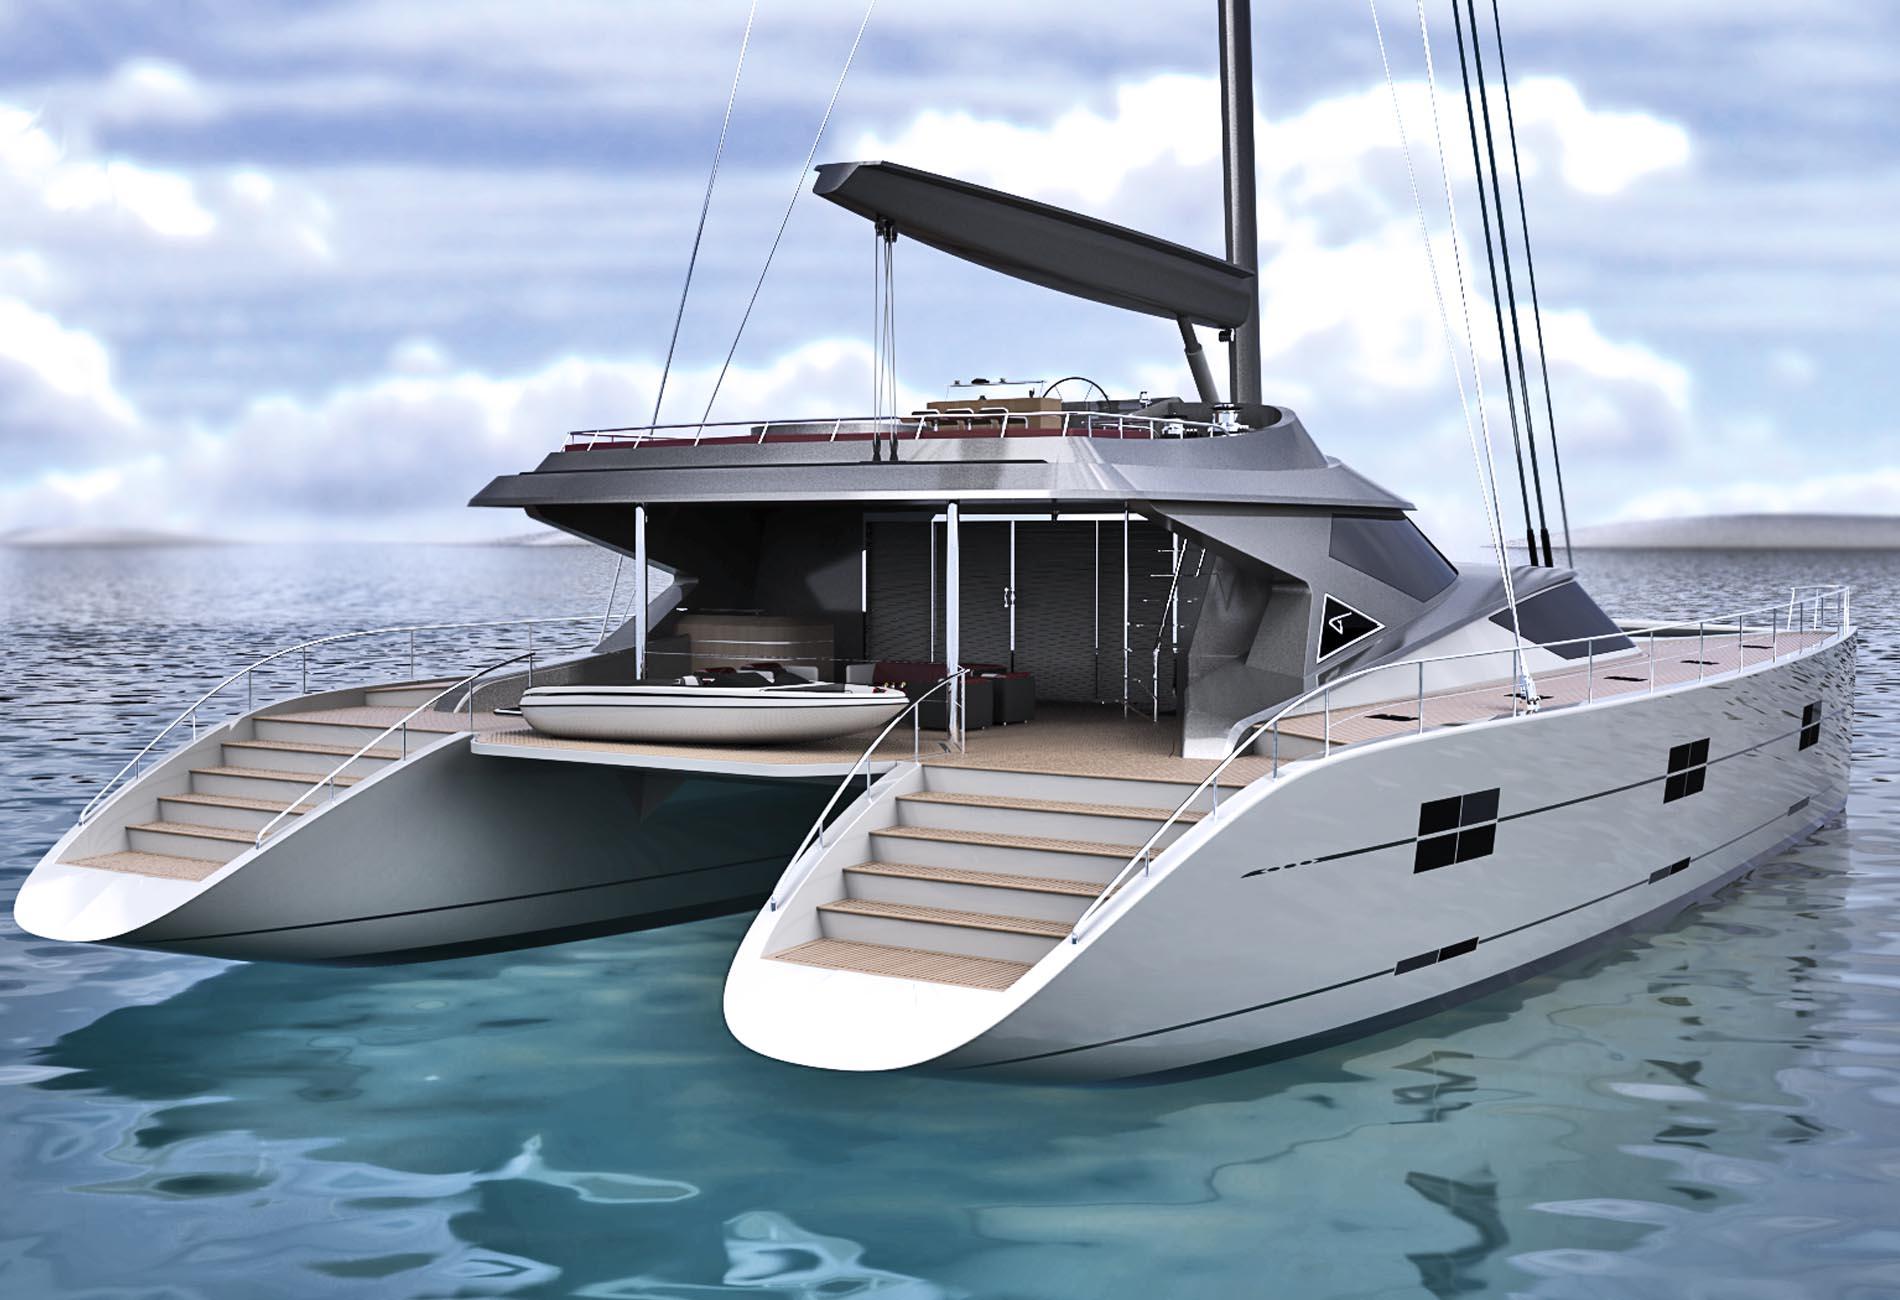 Yapluka85-catamaran-aluminium-de-voyage-sailing-yacht-vincent-lebailly-architecture-navale